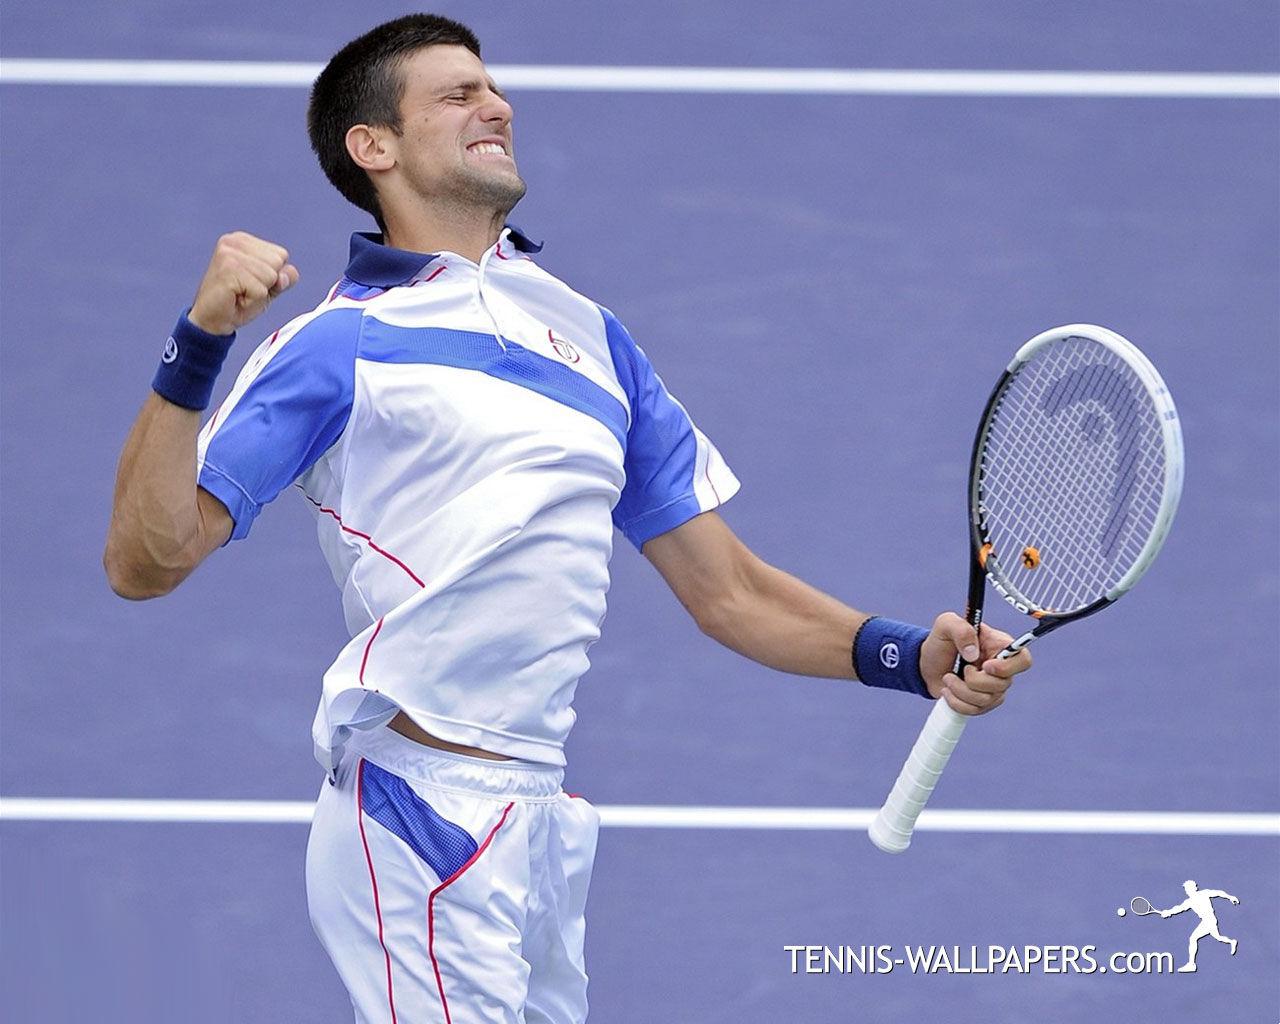 Novak Djokovic Wallpapers and Desktop Backgrounds Page 4 1280x1024